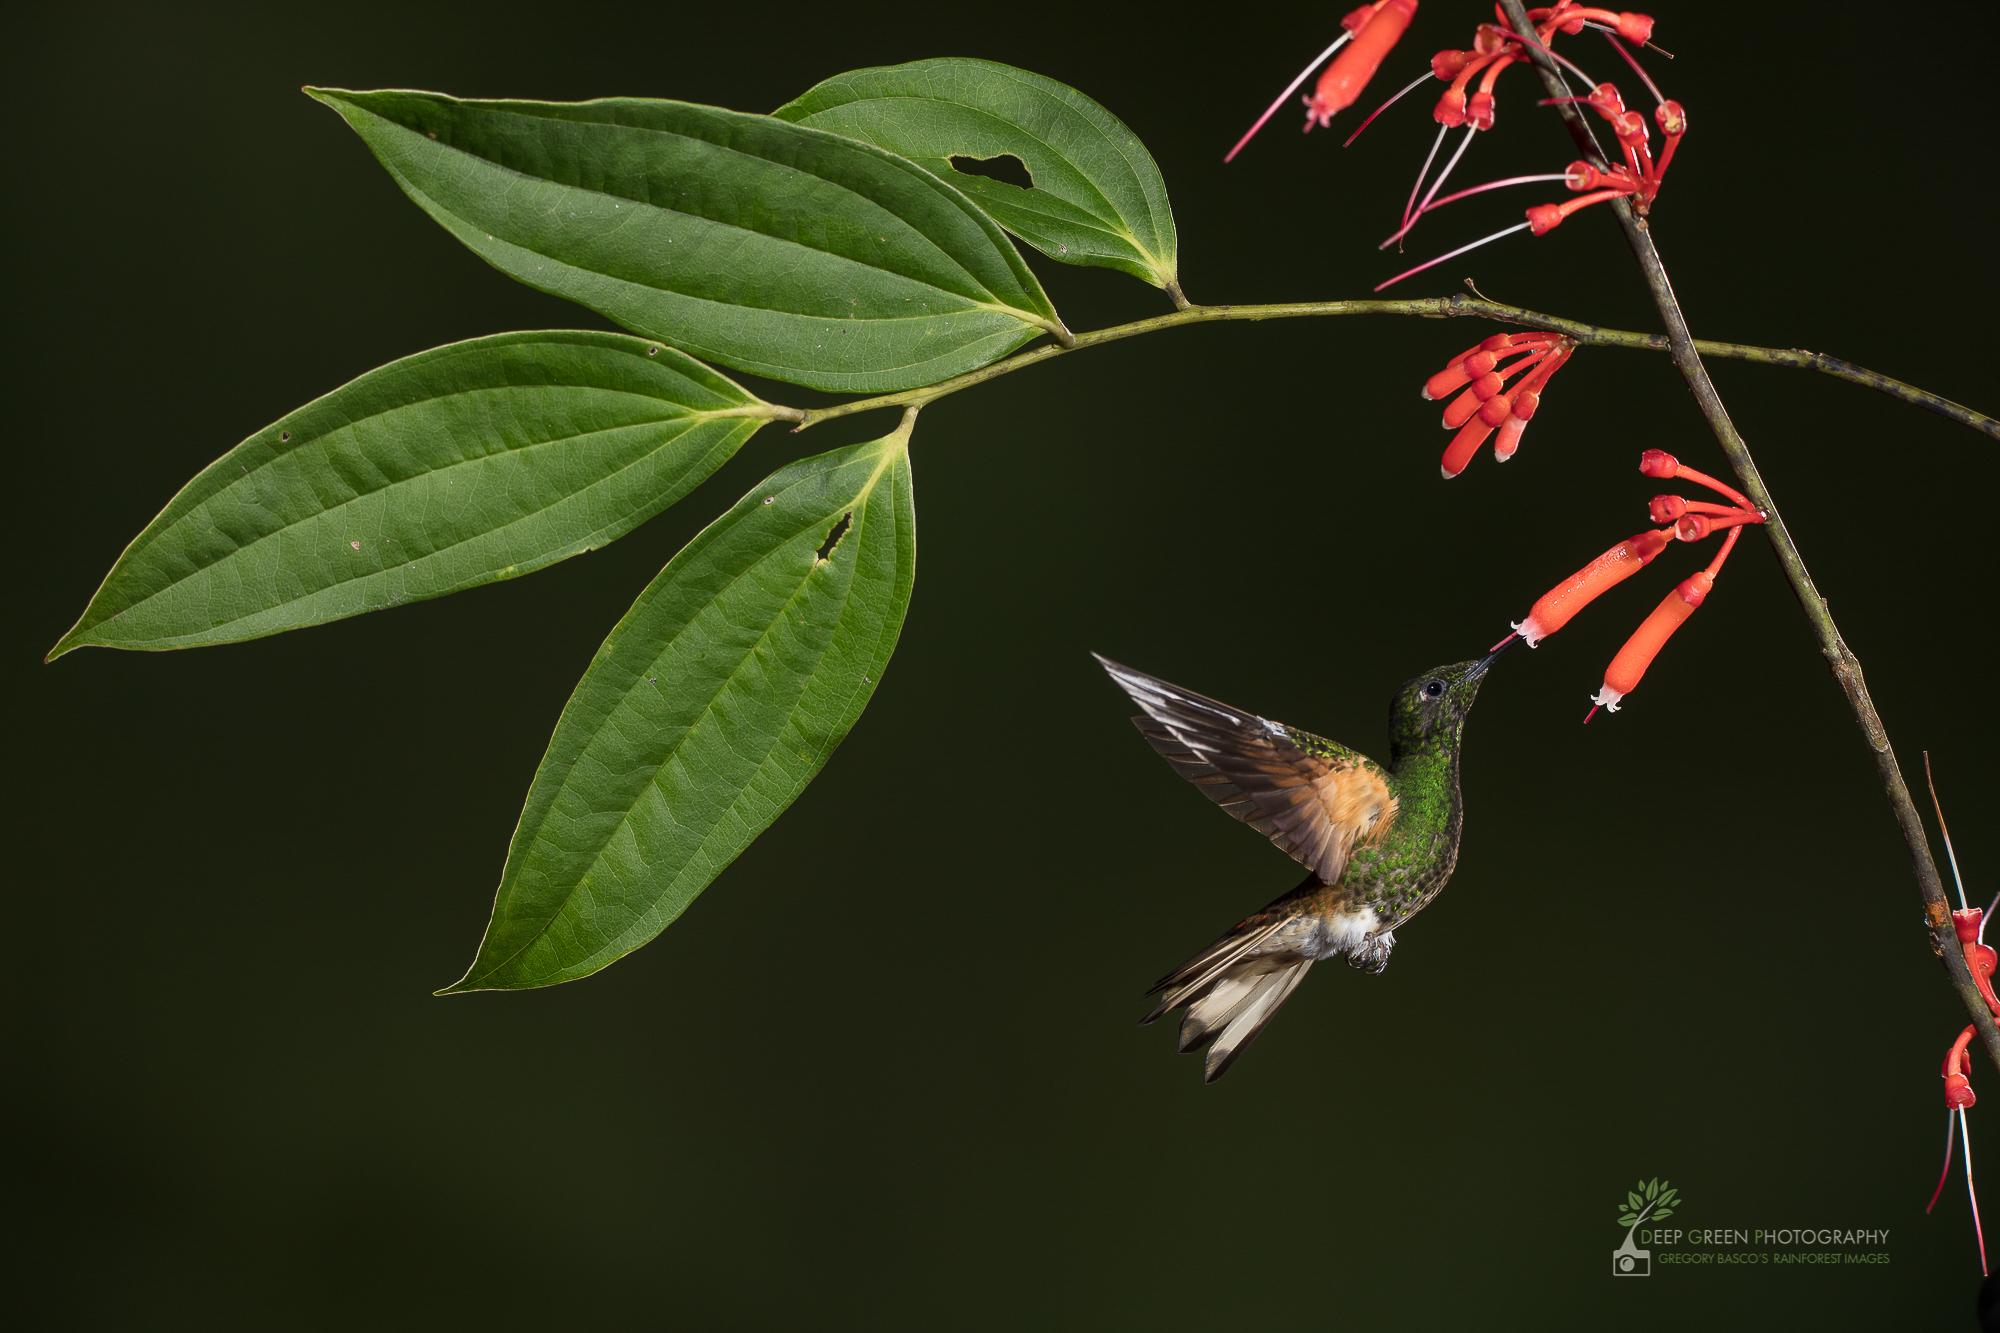 DGP-stock-hummingbirds-131.jpg